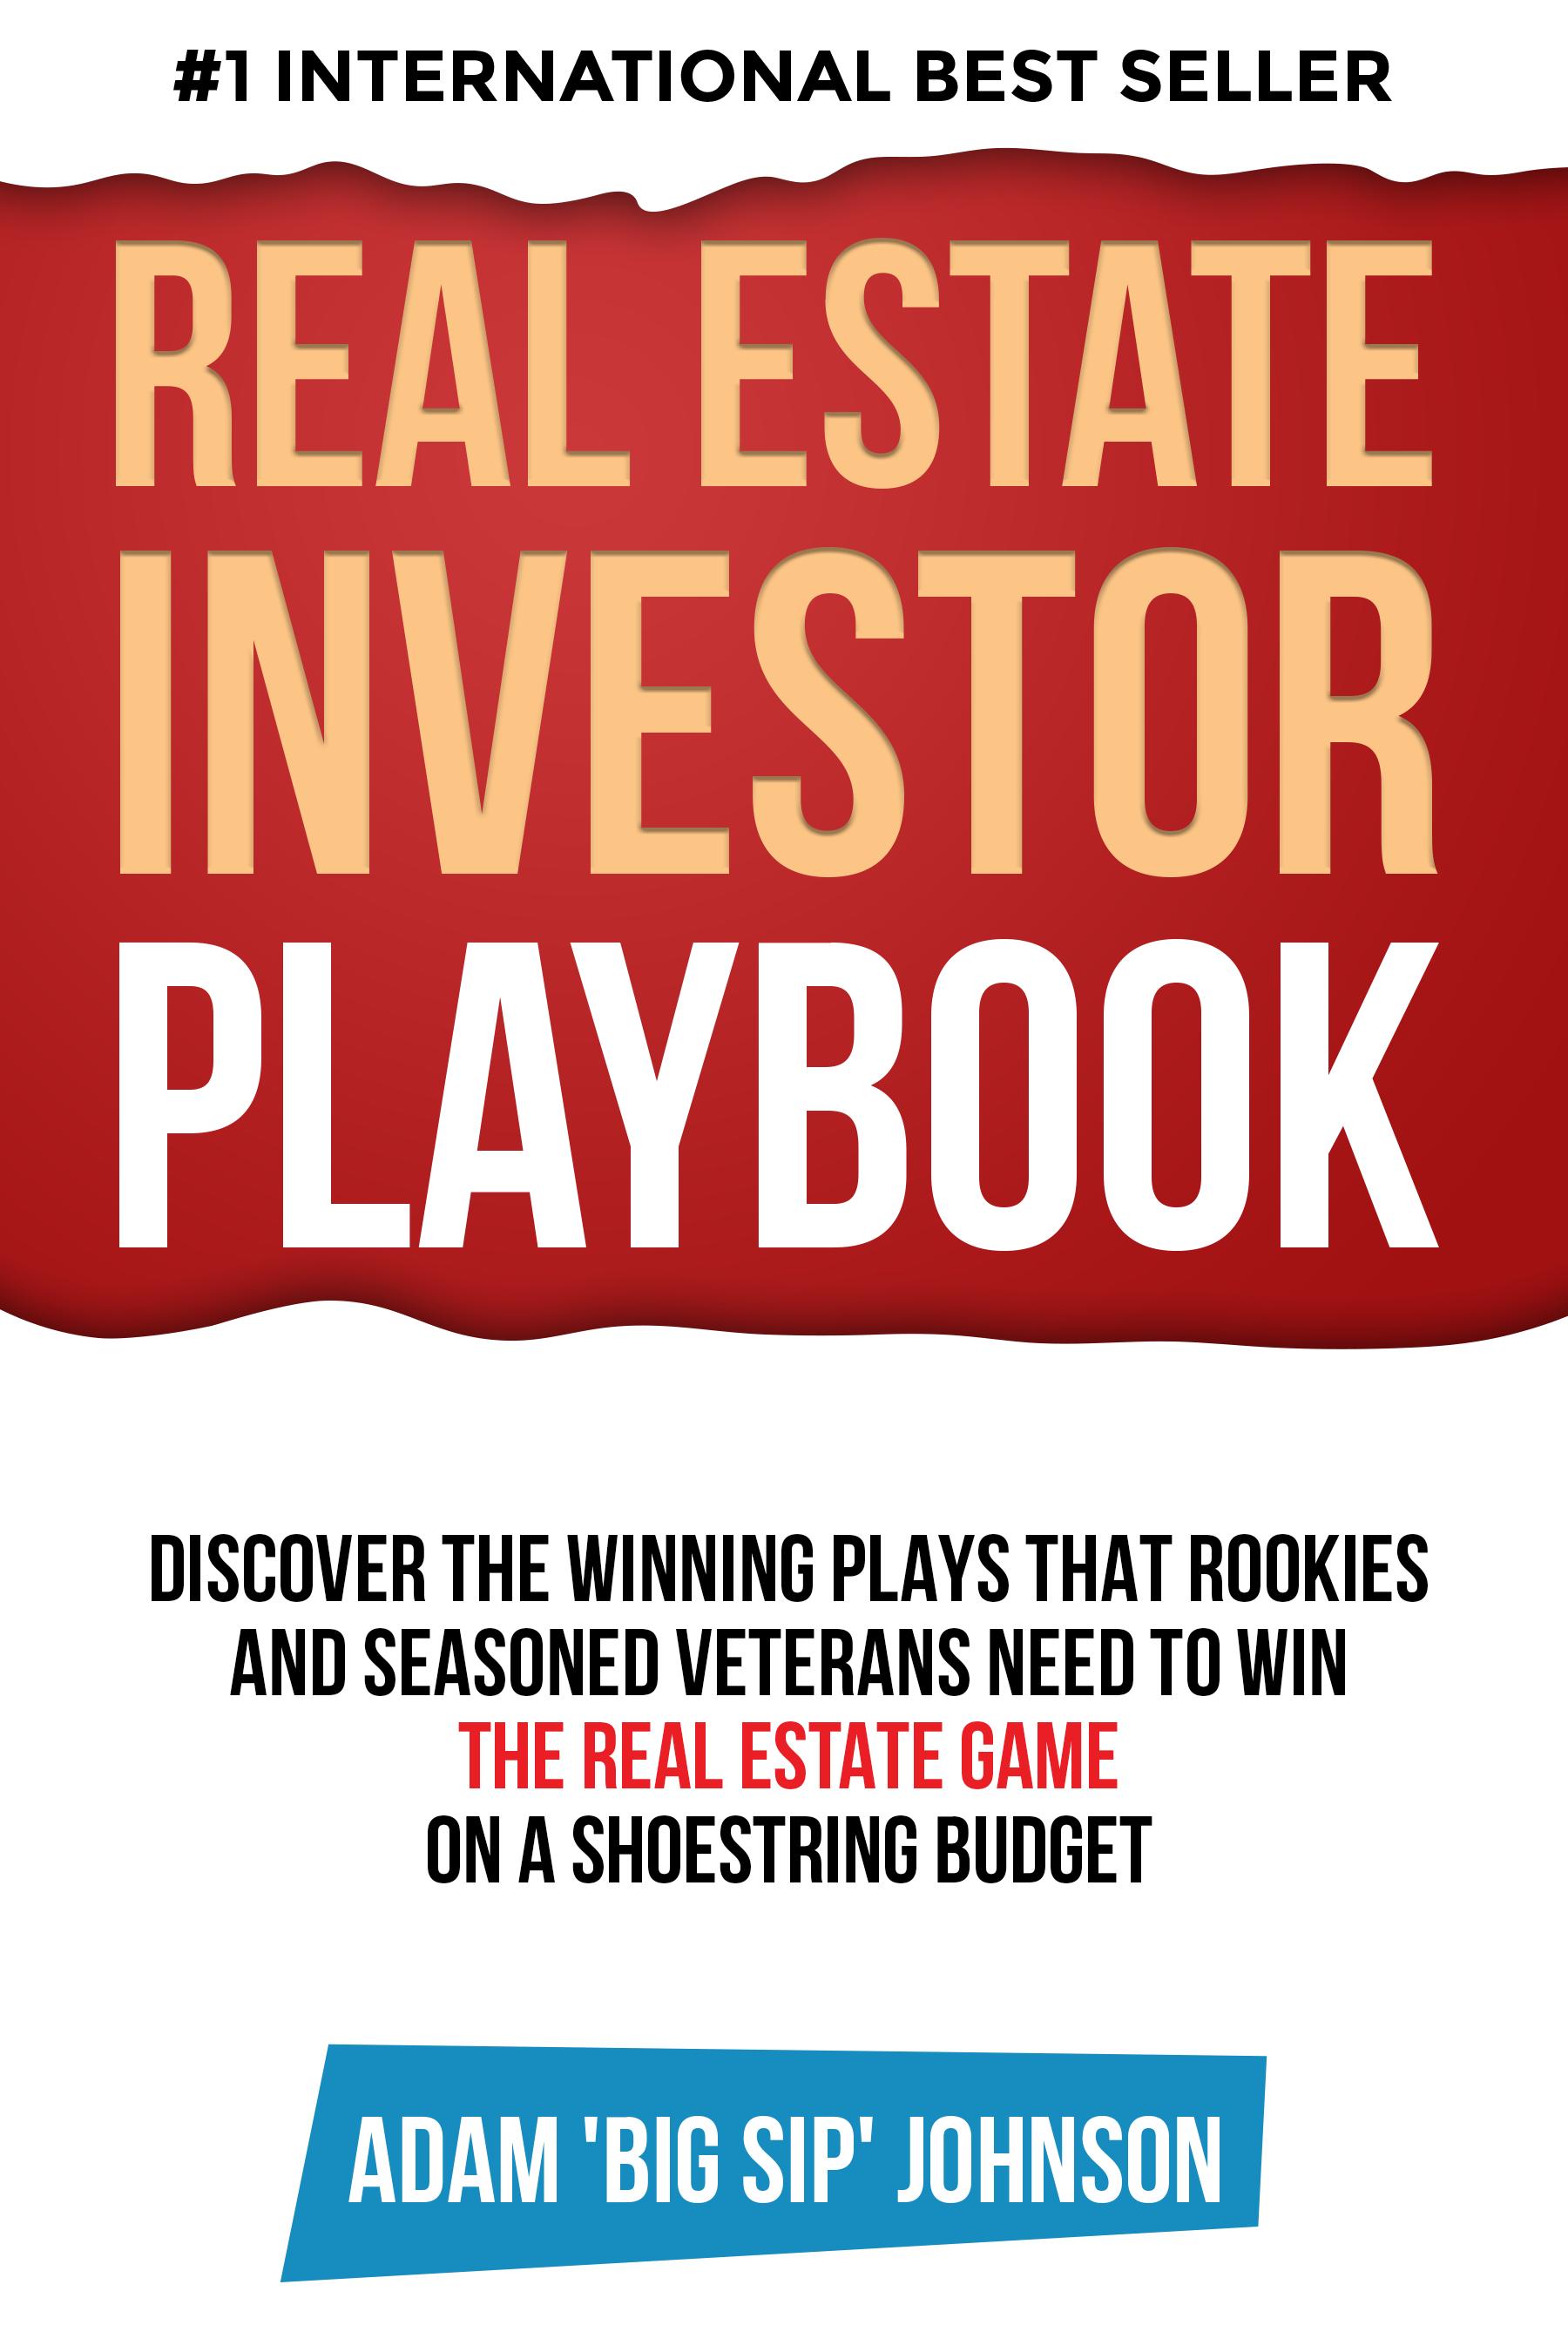 Real Estate Investor Playbook